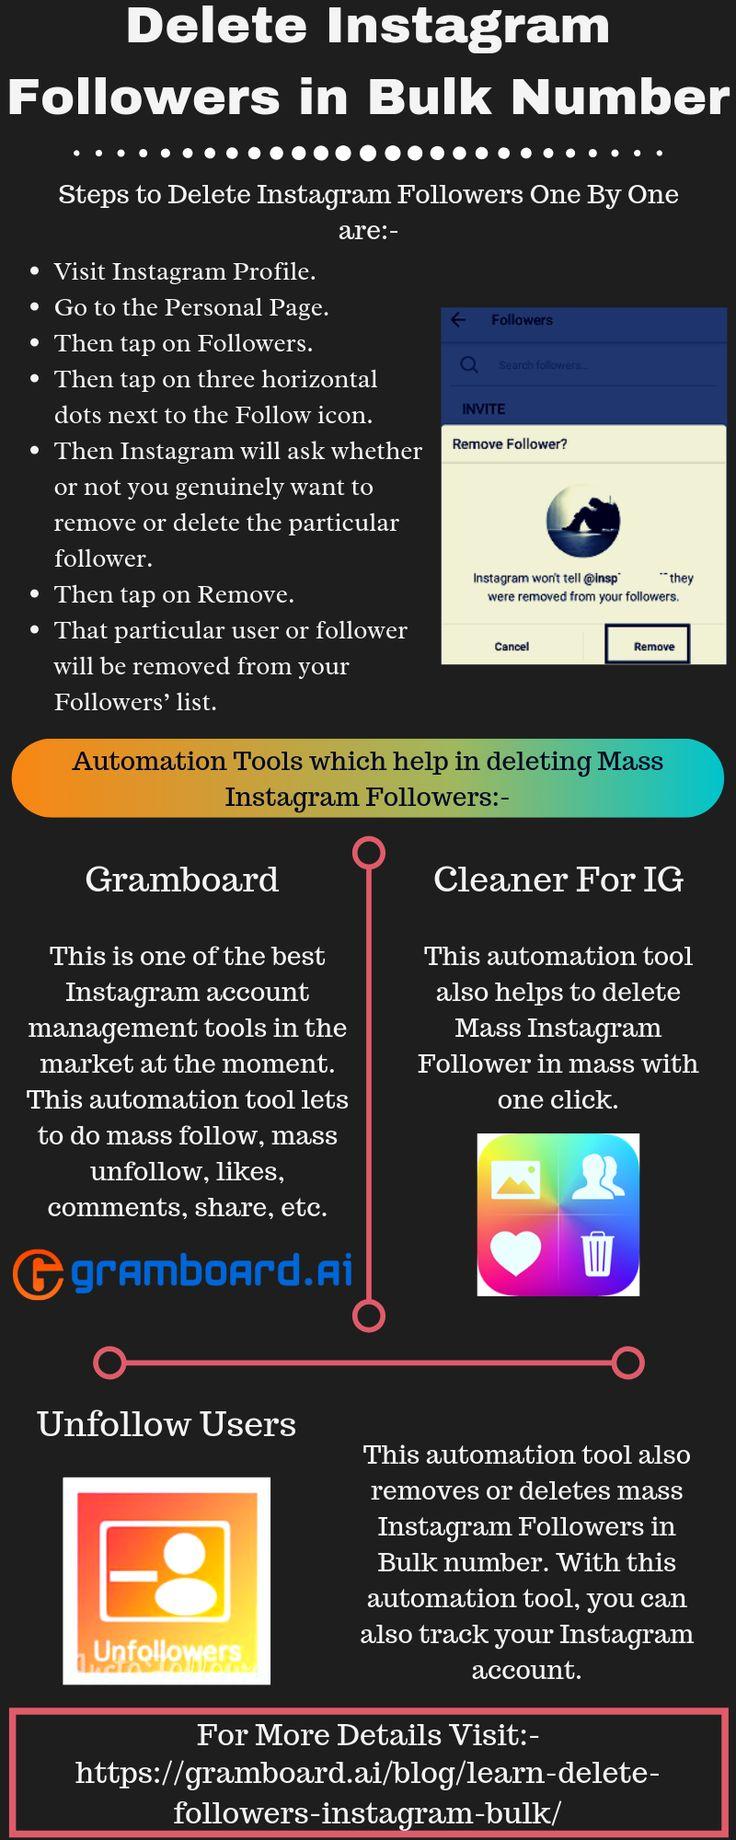 Delete instagram followers in bulk number how to delete